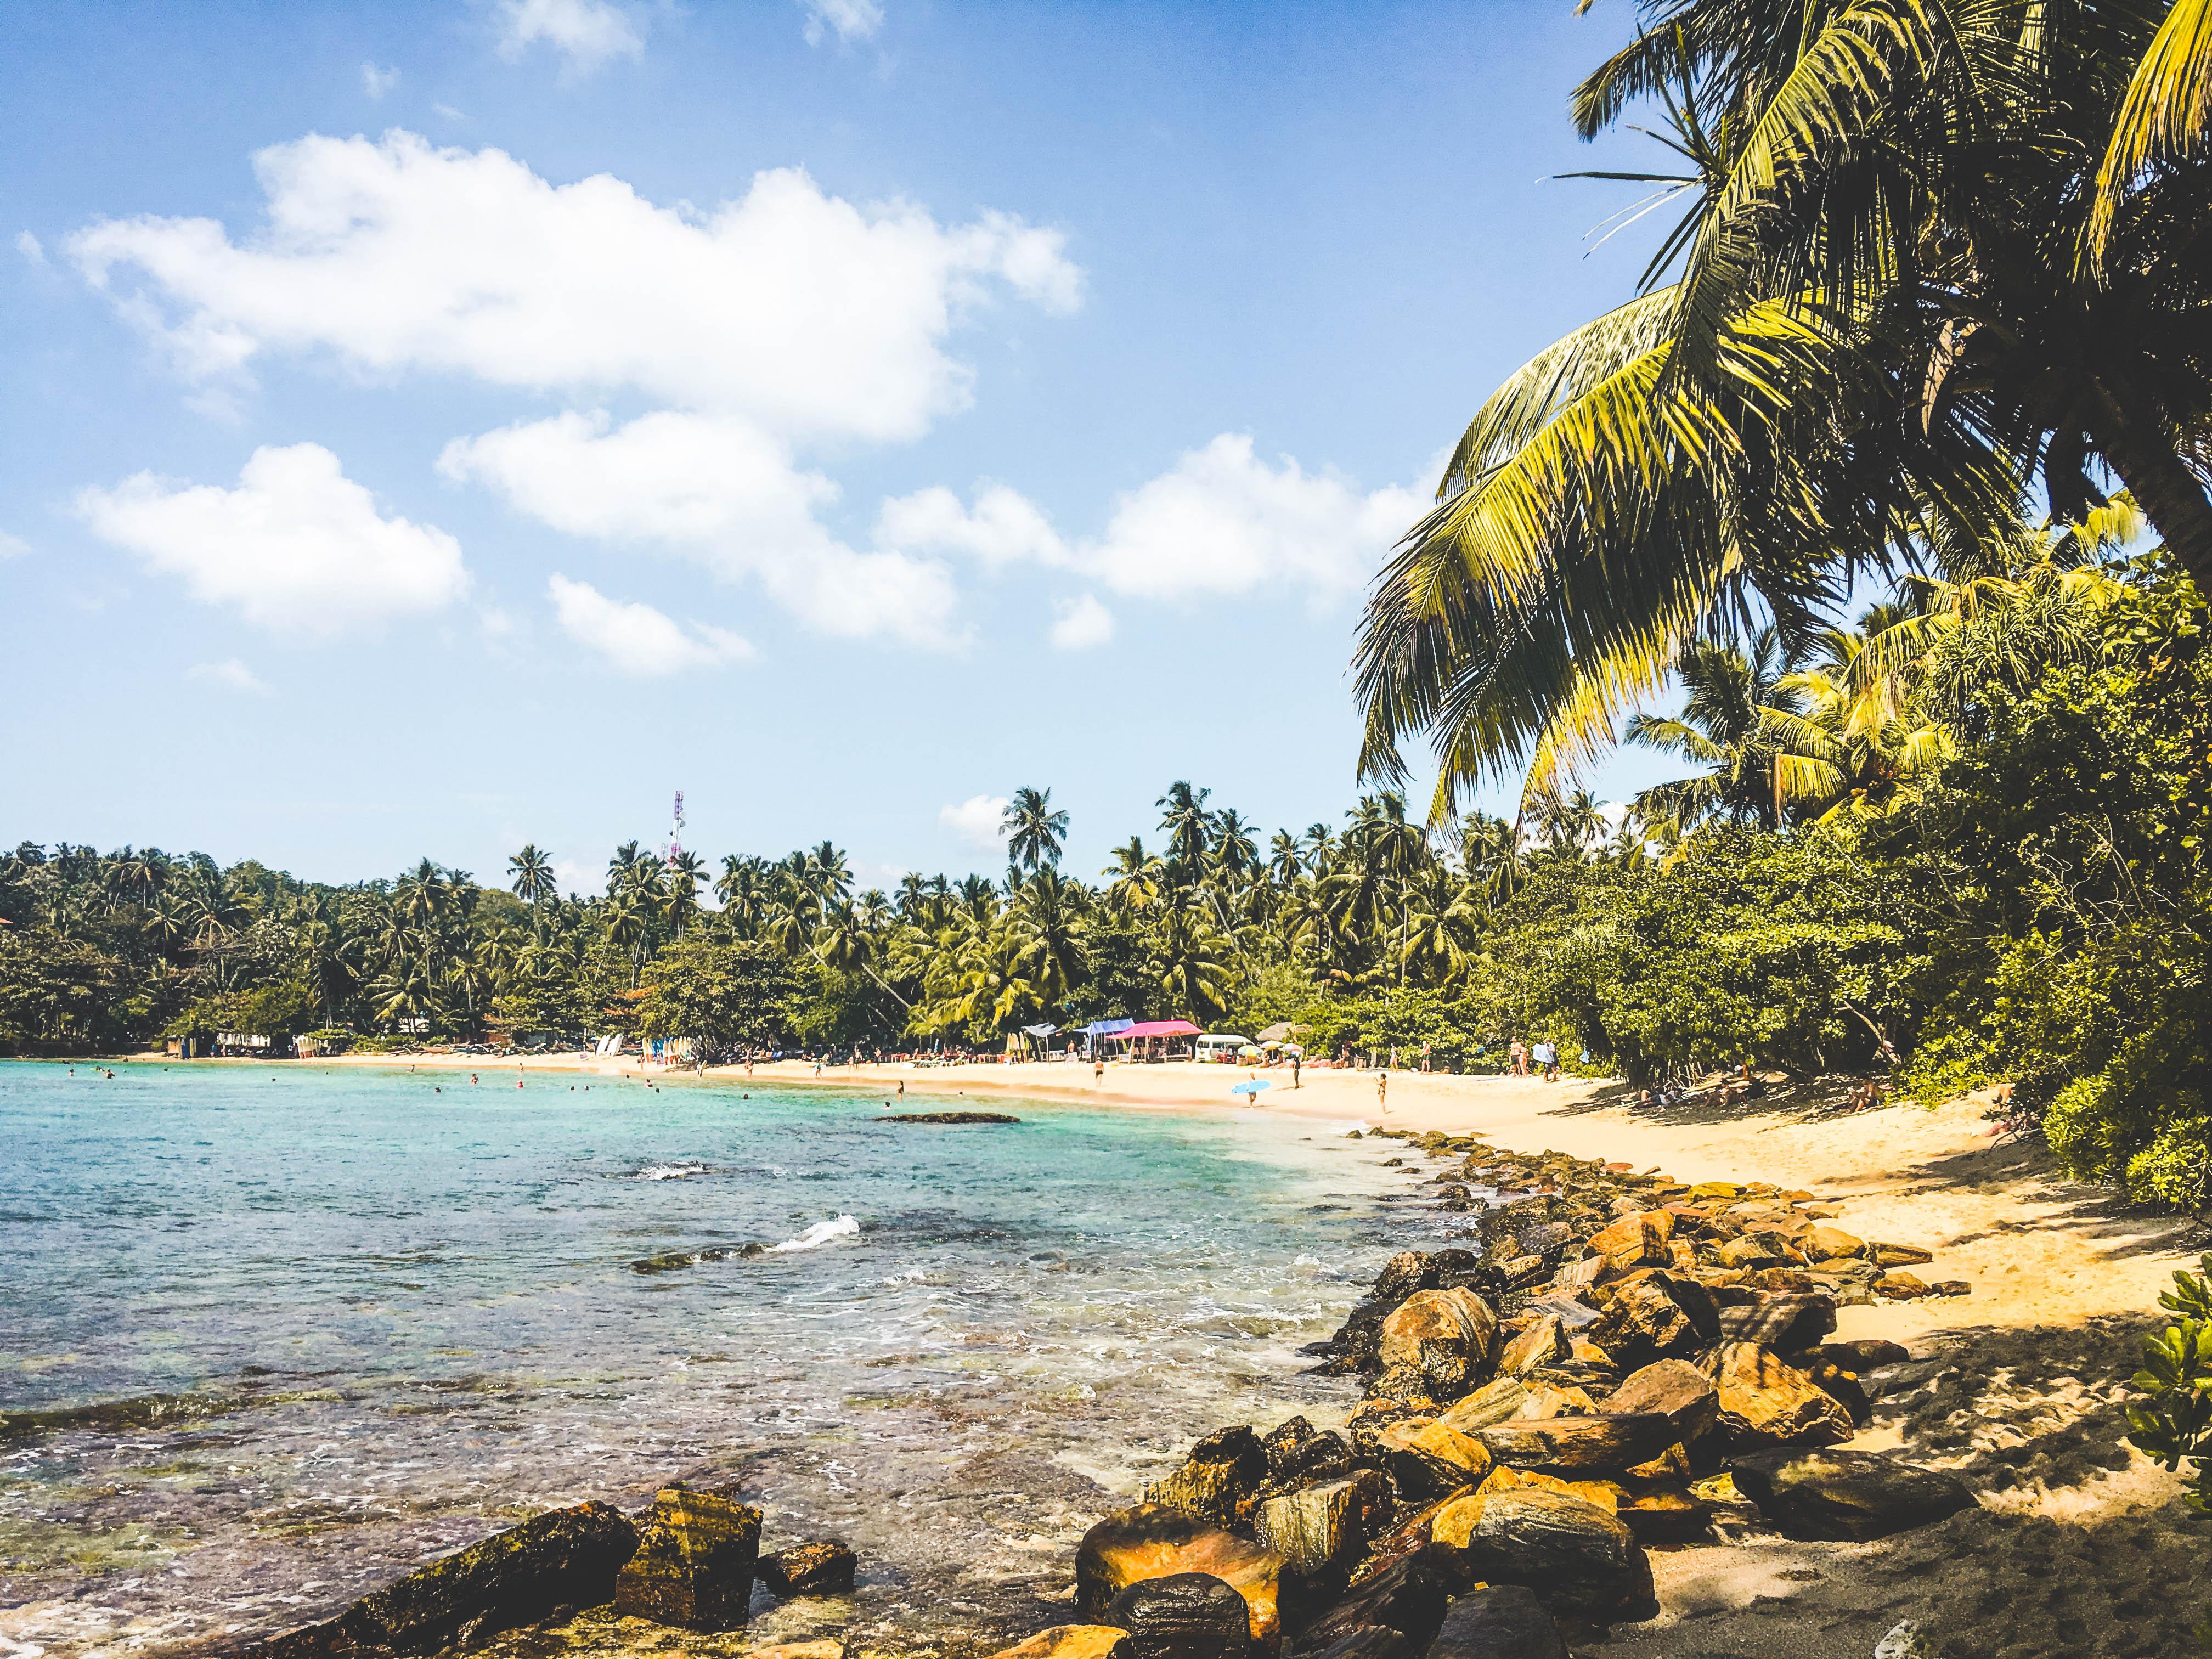 Things to do in Sri Lanka - Hiriketiya Bay c. Sarah Gibbons